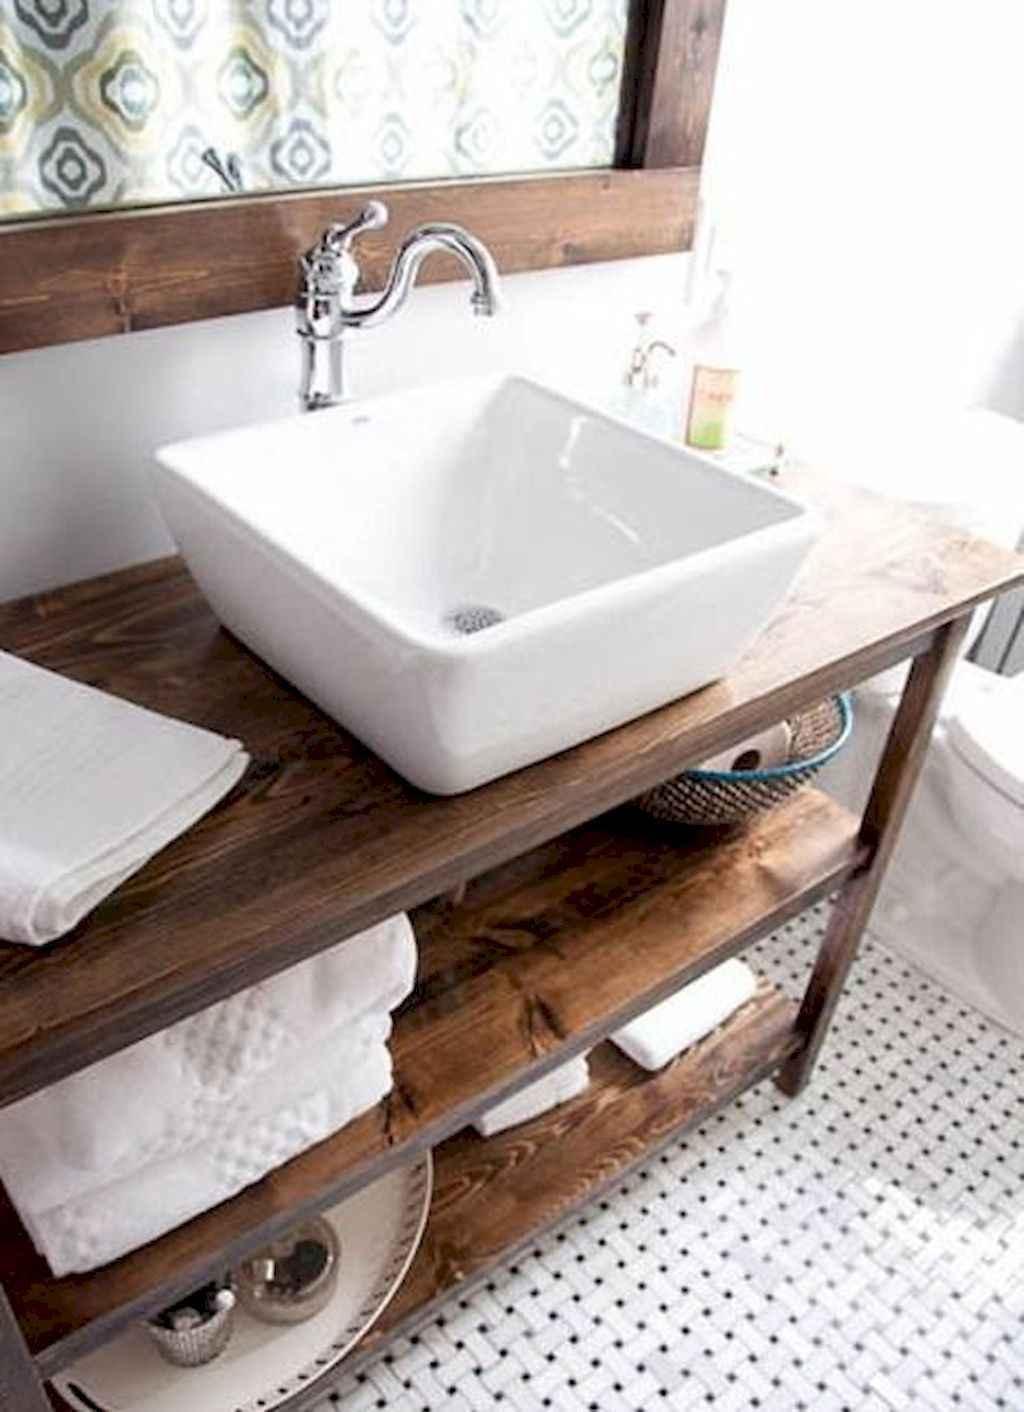 125 awesome farmhouse bathroom vanity remodel ideas (60)